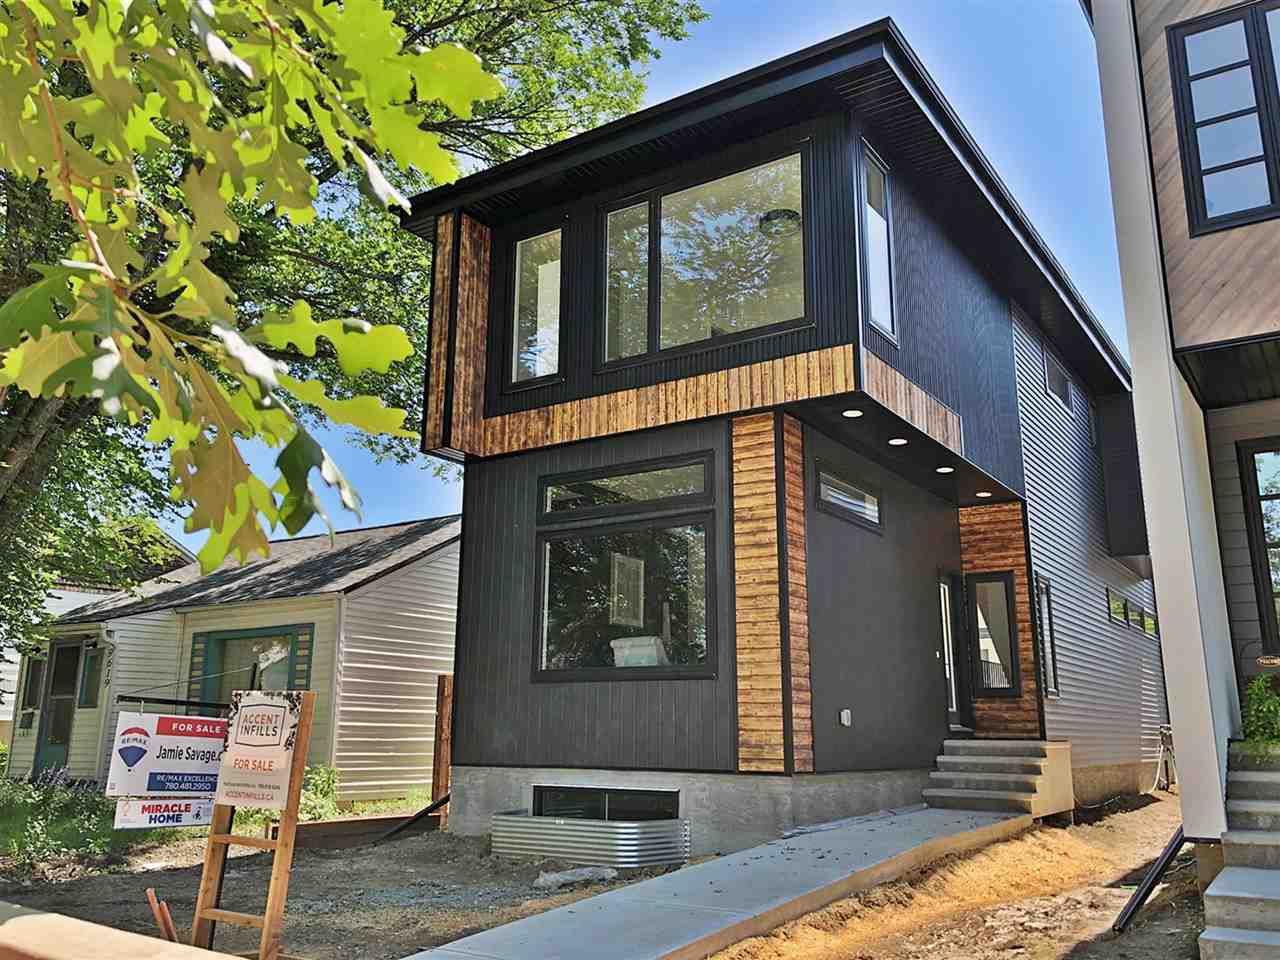 Main Photo: 9623 80 Avenue in Edmonton: Zone 17 House for sale : MLS®# E4159621